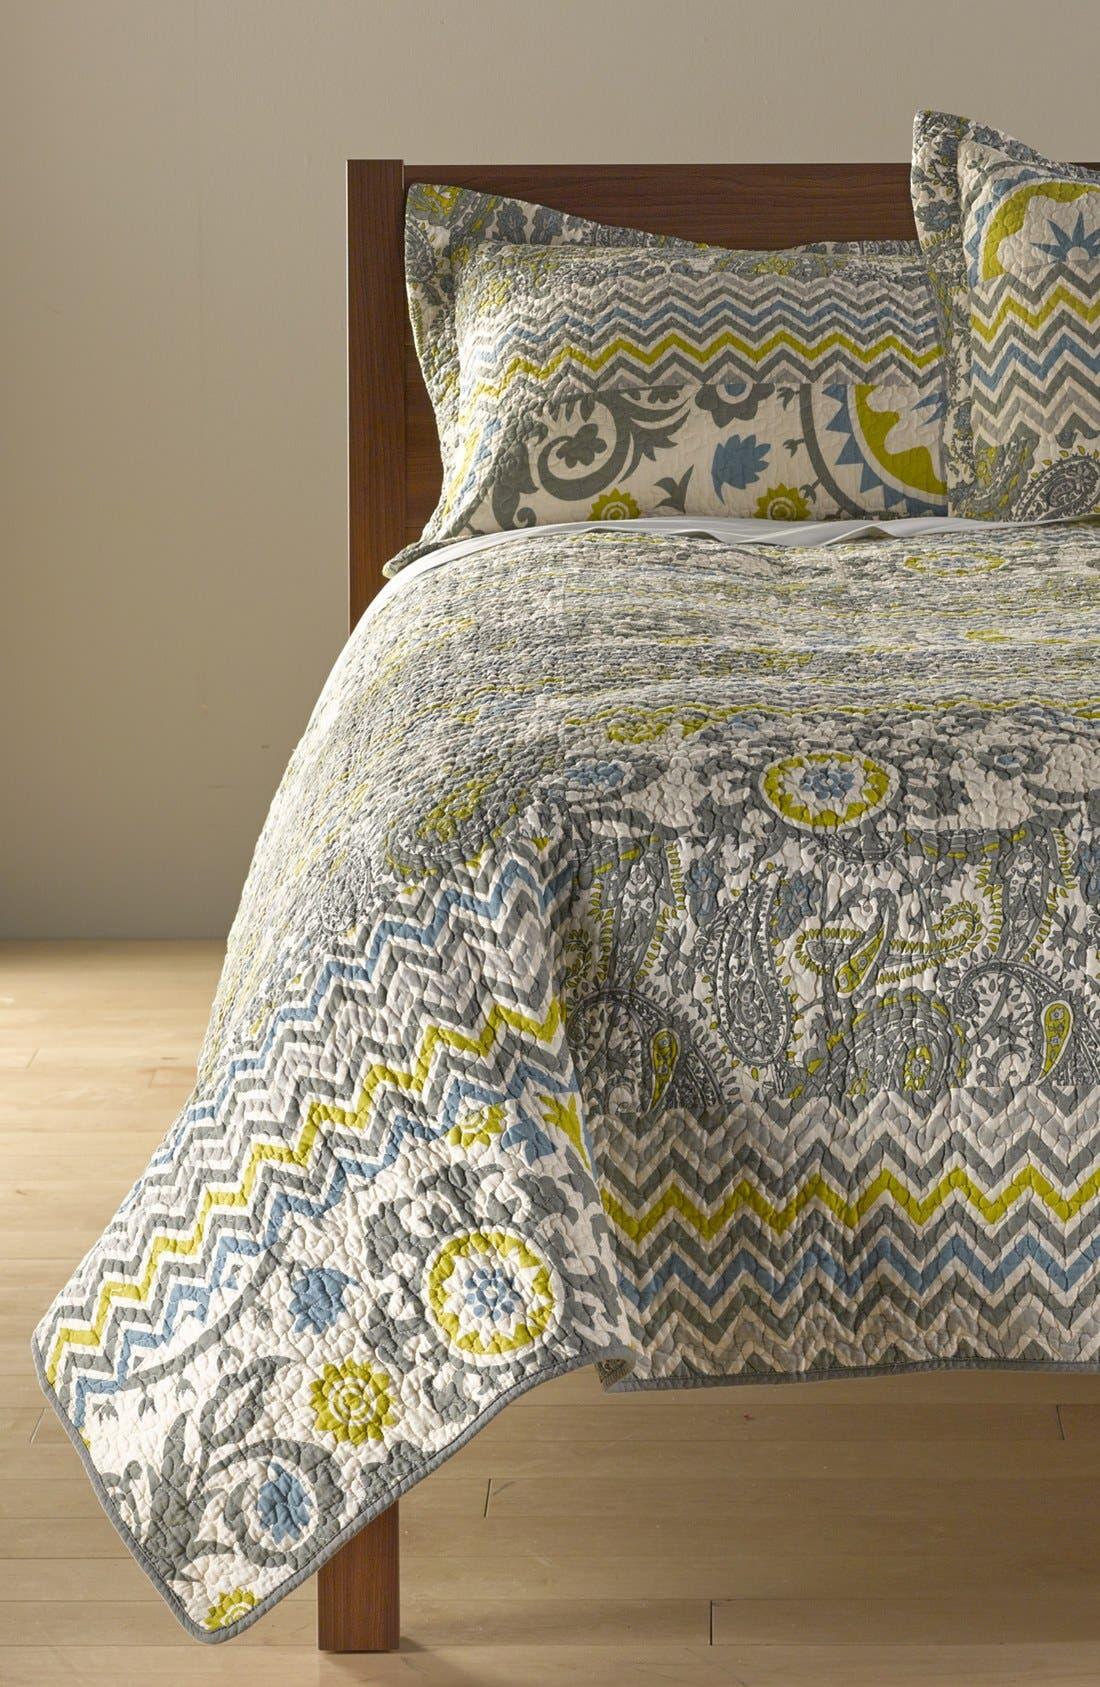 HEDAYA HOME FASHIONS,                             'Verano' Quilt,                             Main thumbnail 1, color,                             020